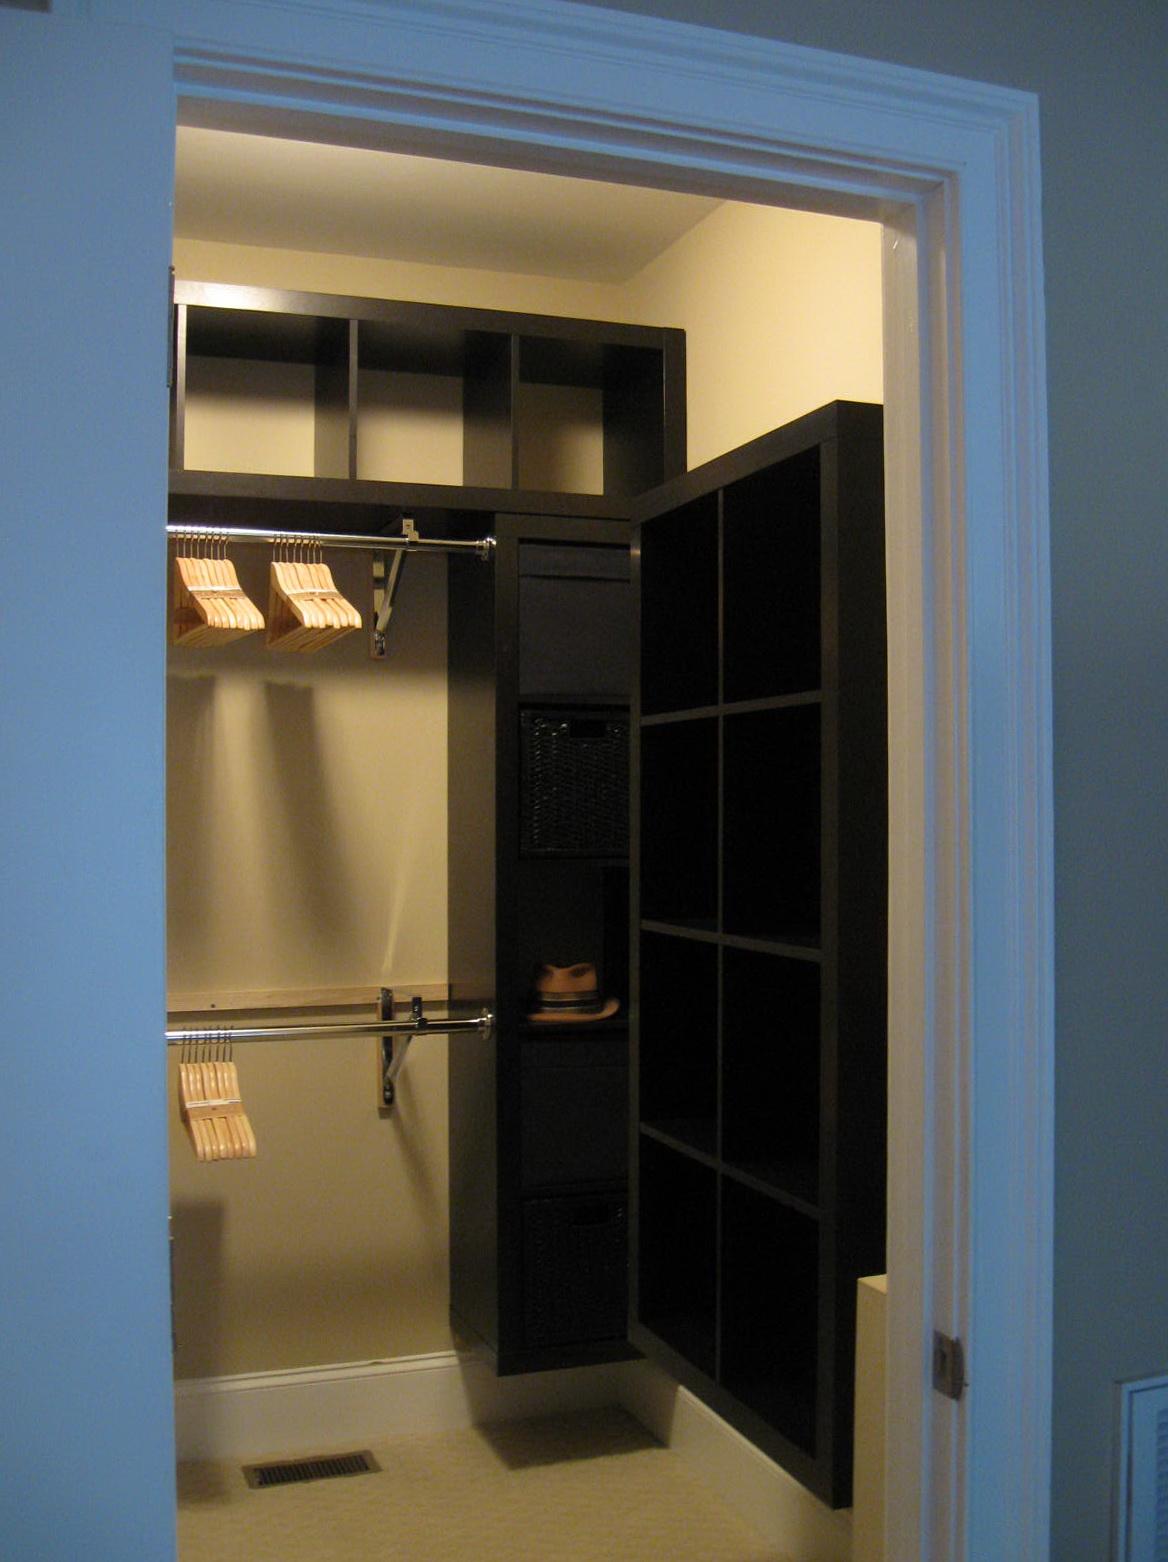 Closet Rod Support Ideas Home Design Ideas